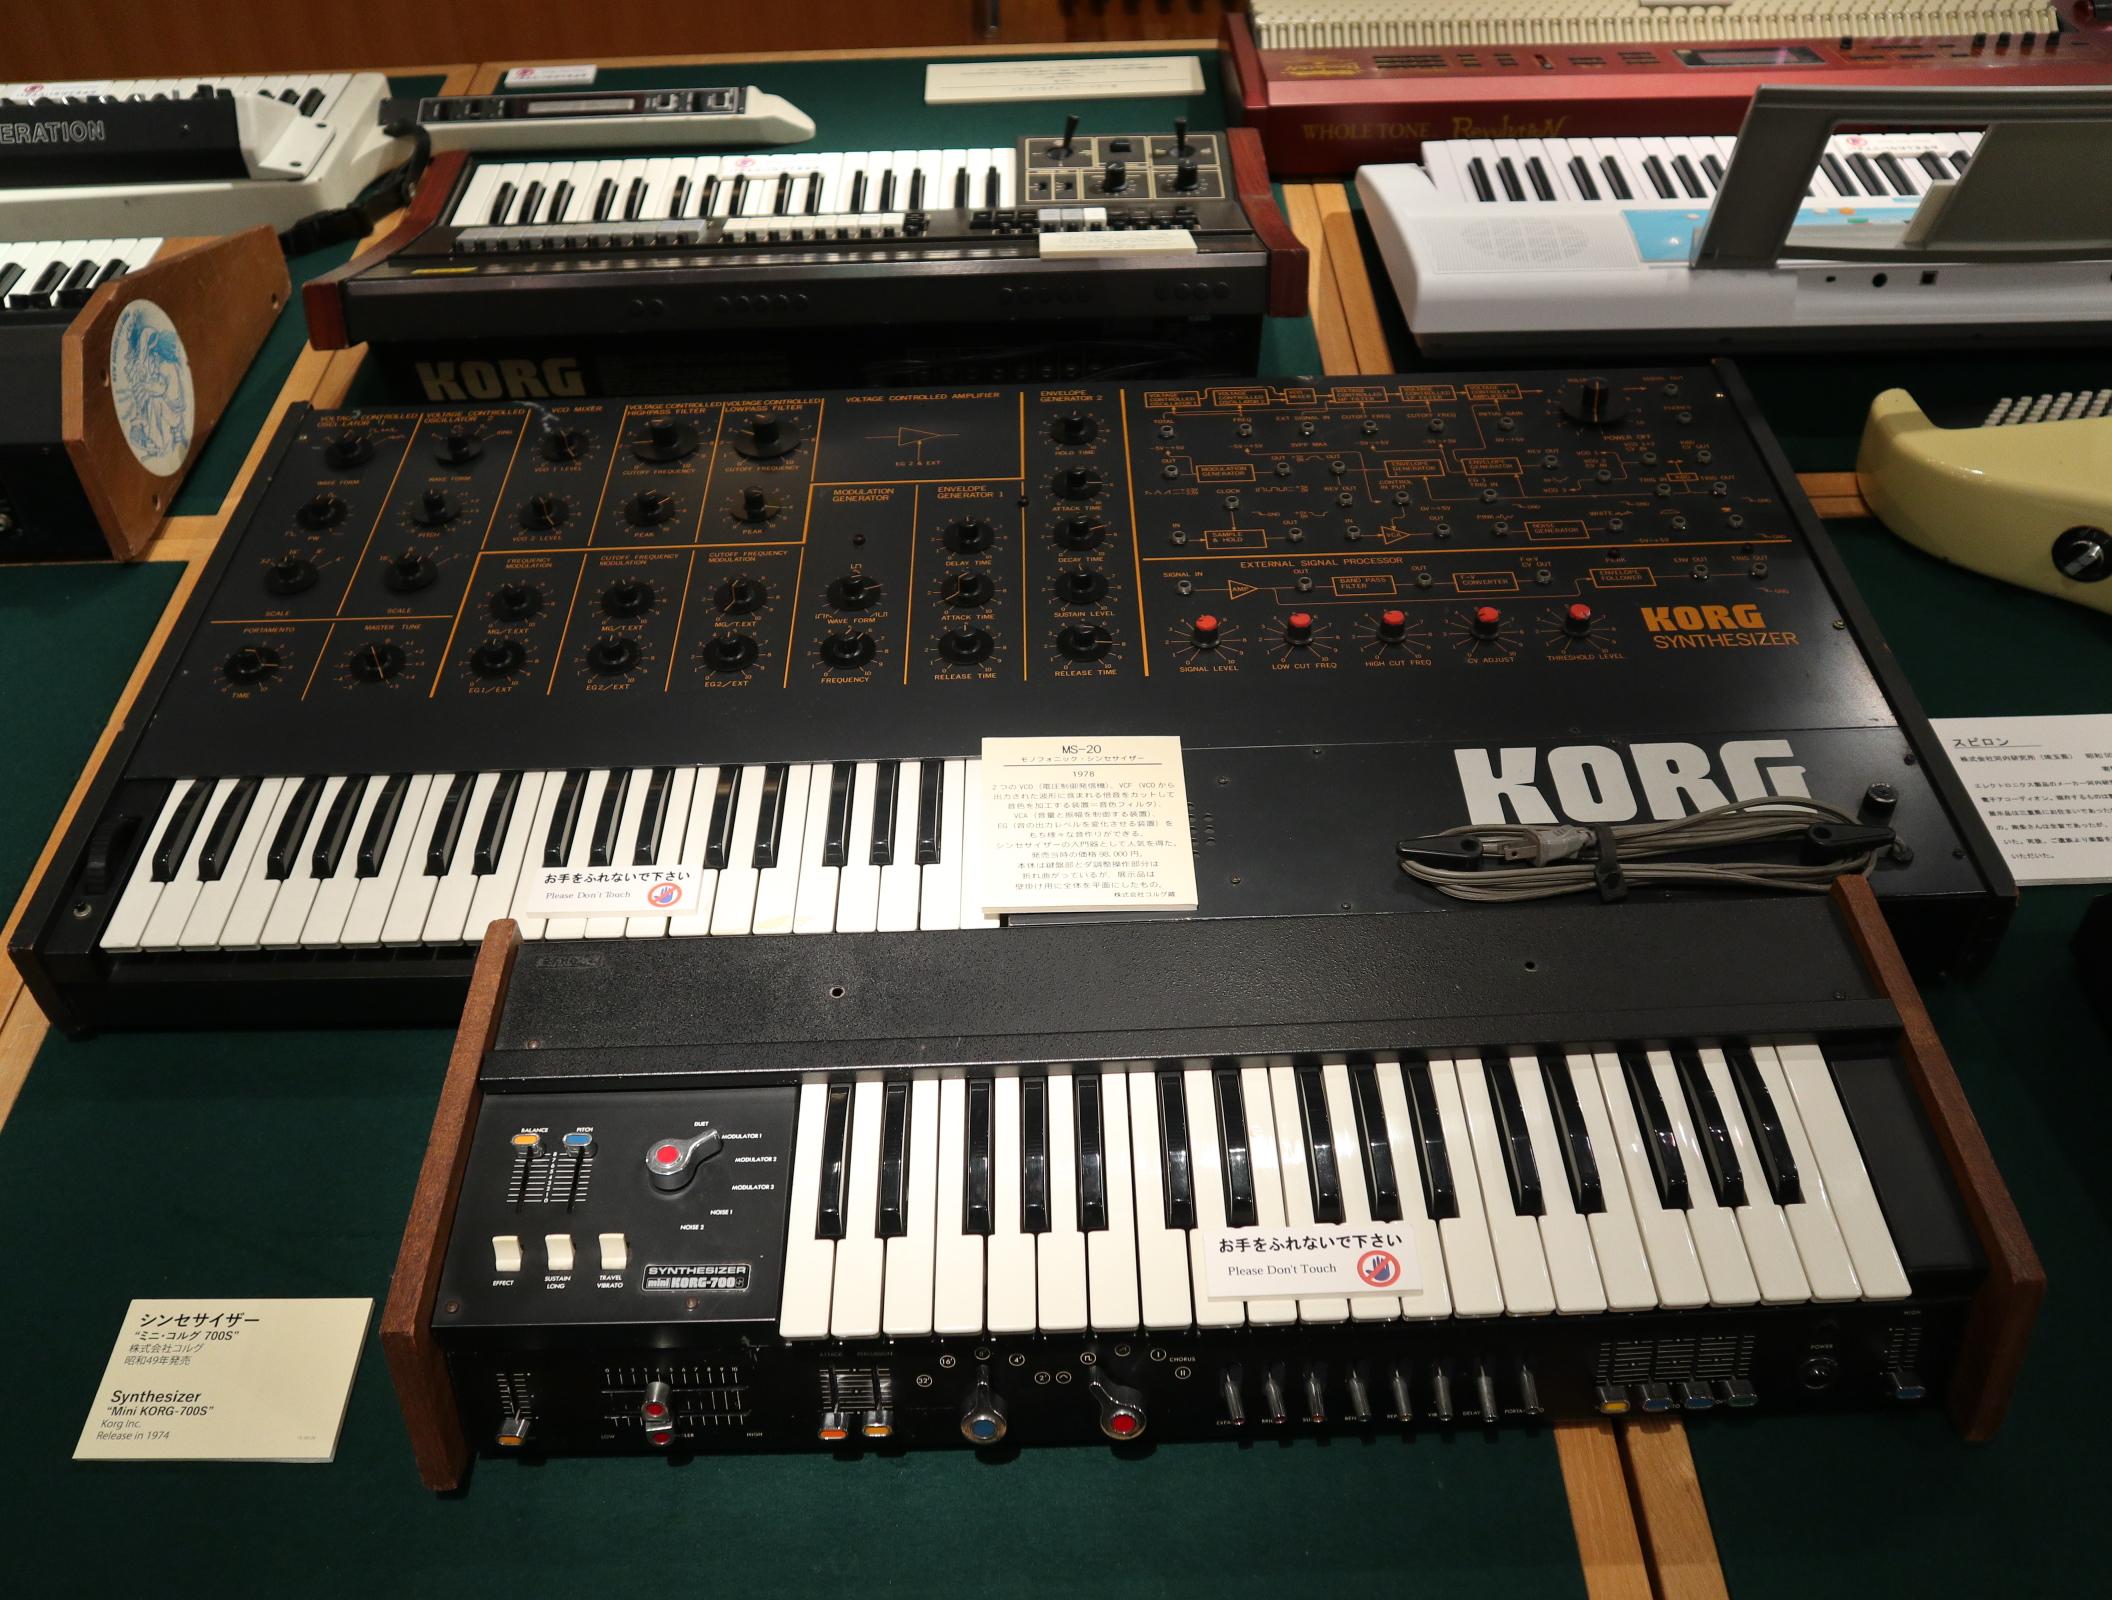 Korg miniKORG 700S (front) and flat panel MS-20 (rear)